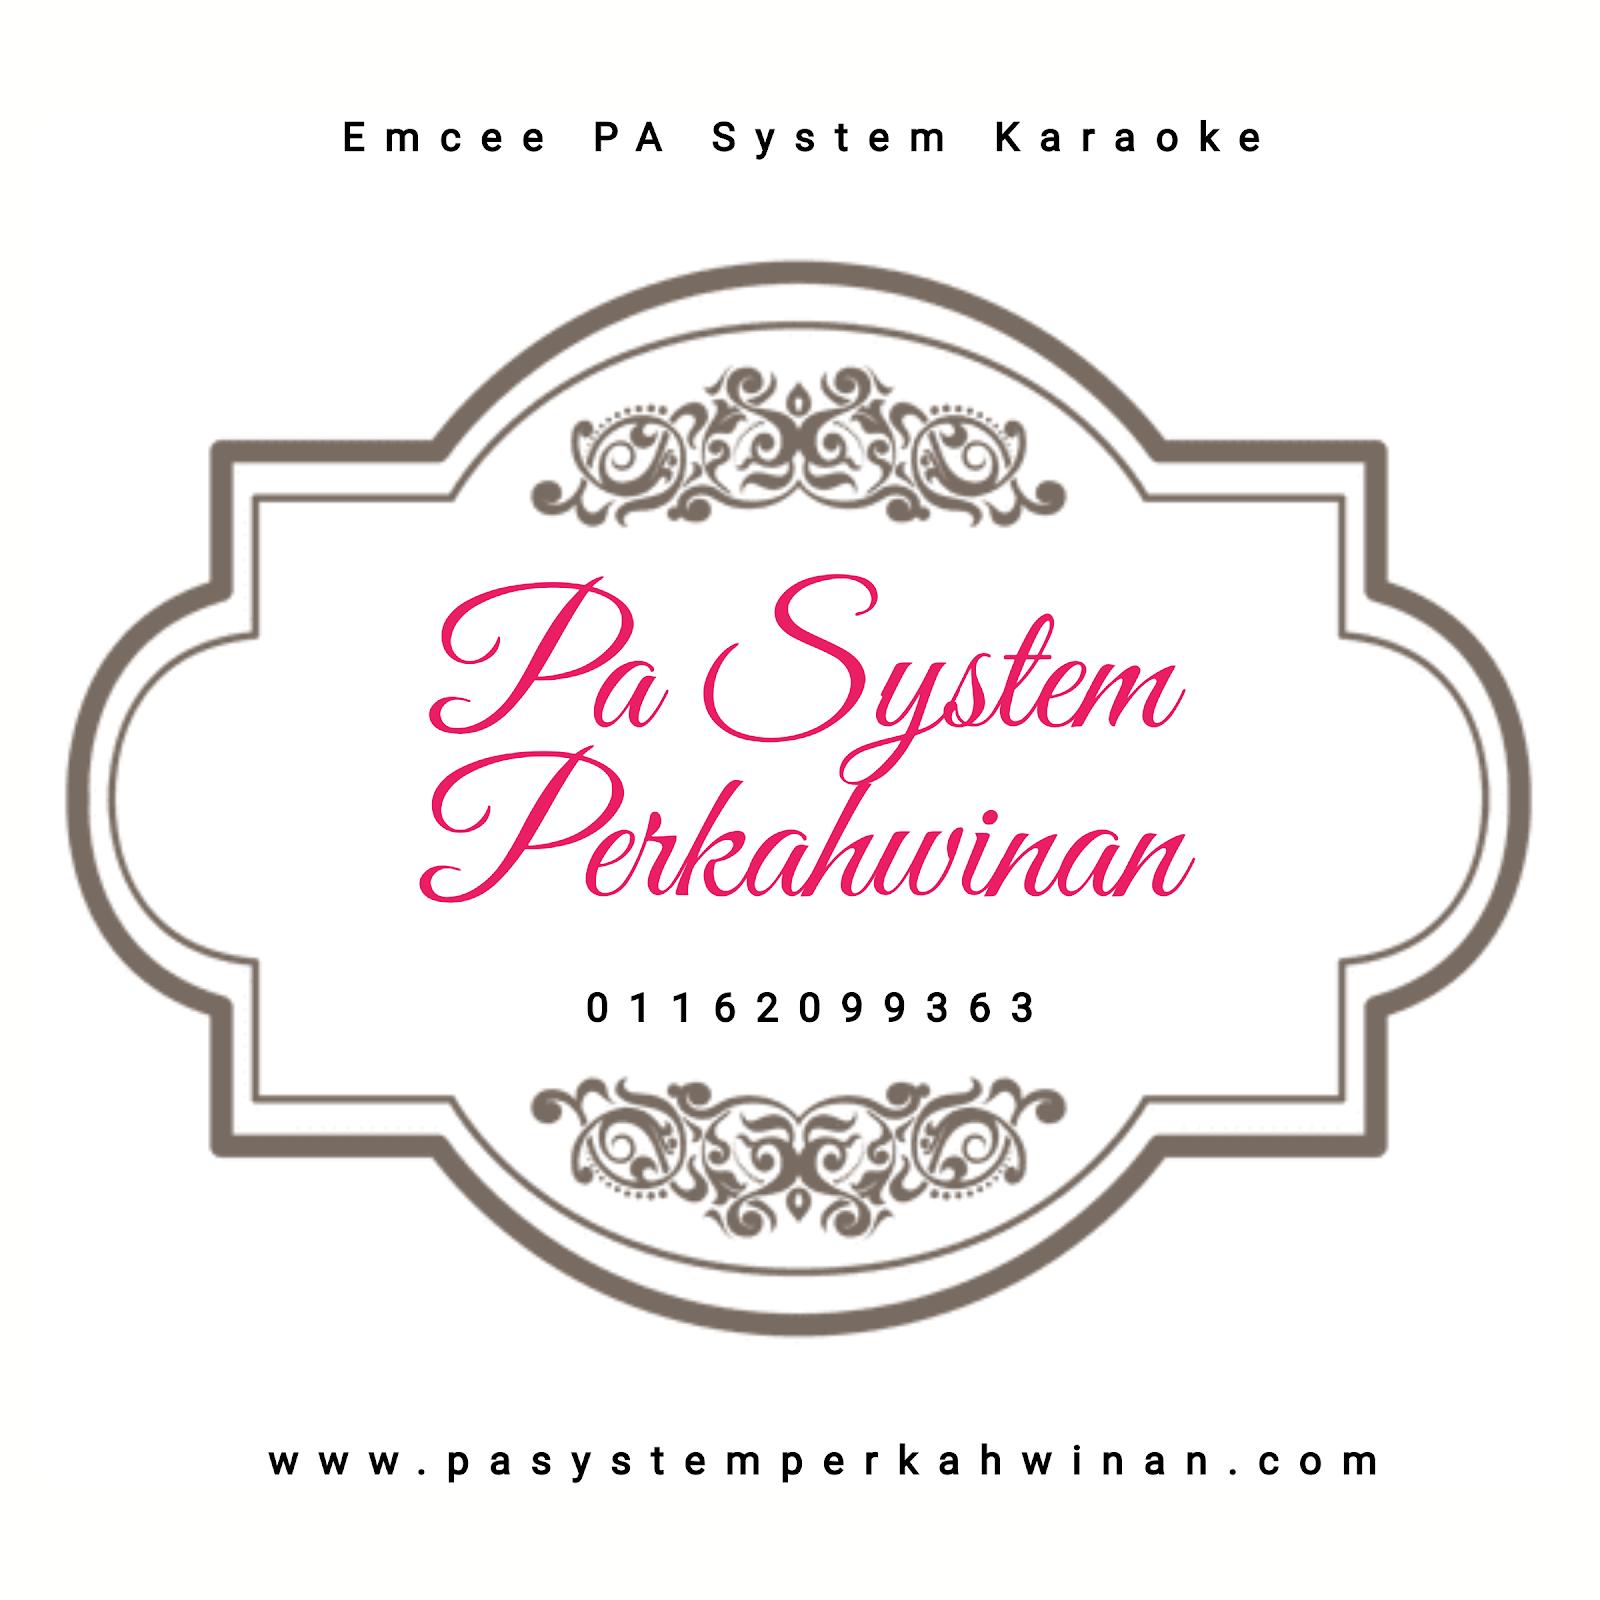 PASYSTEM PERKAHWINAN